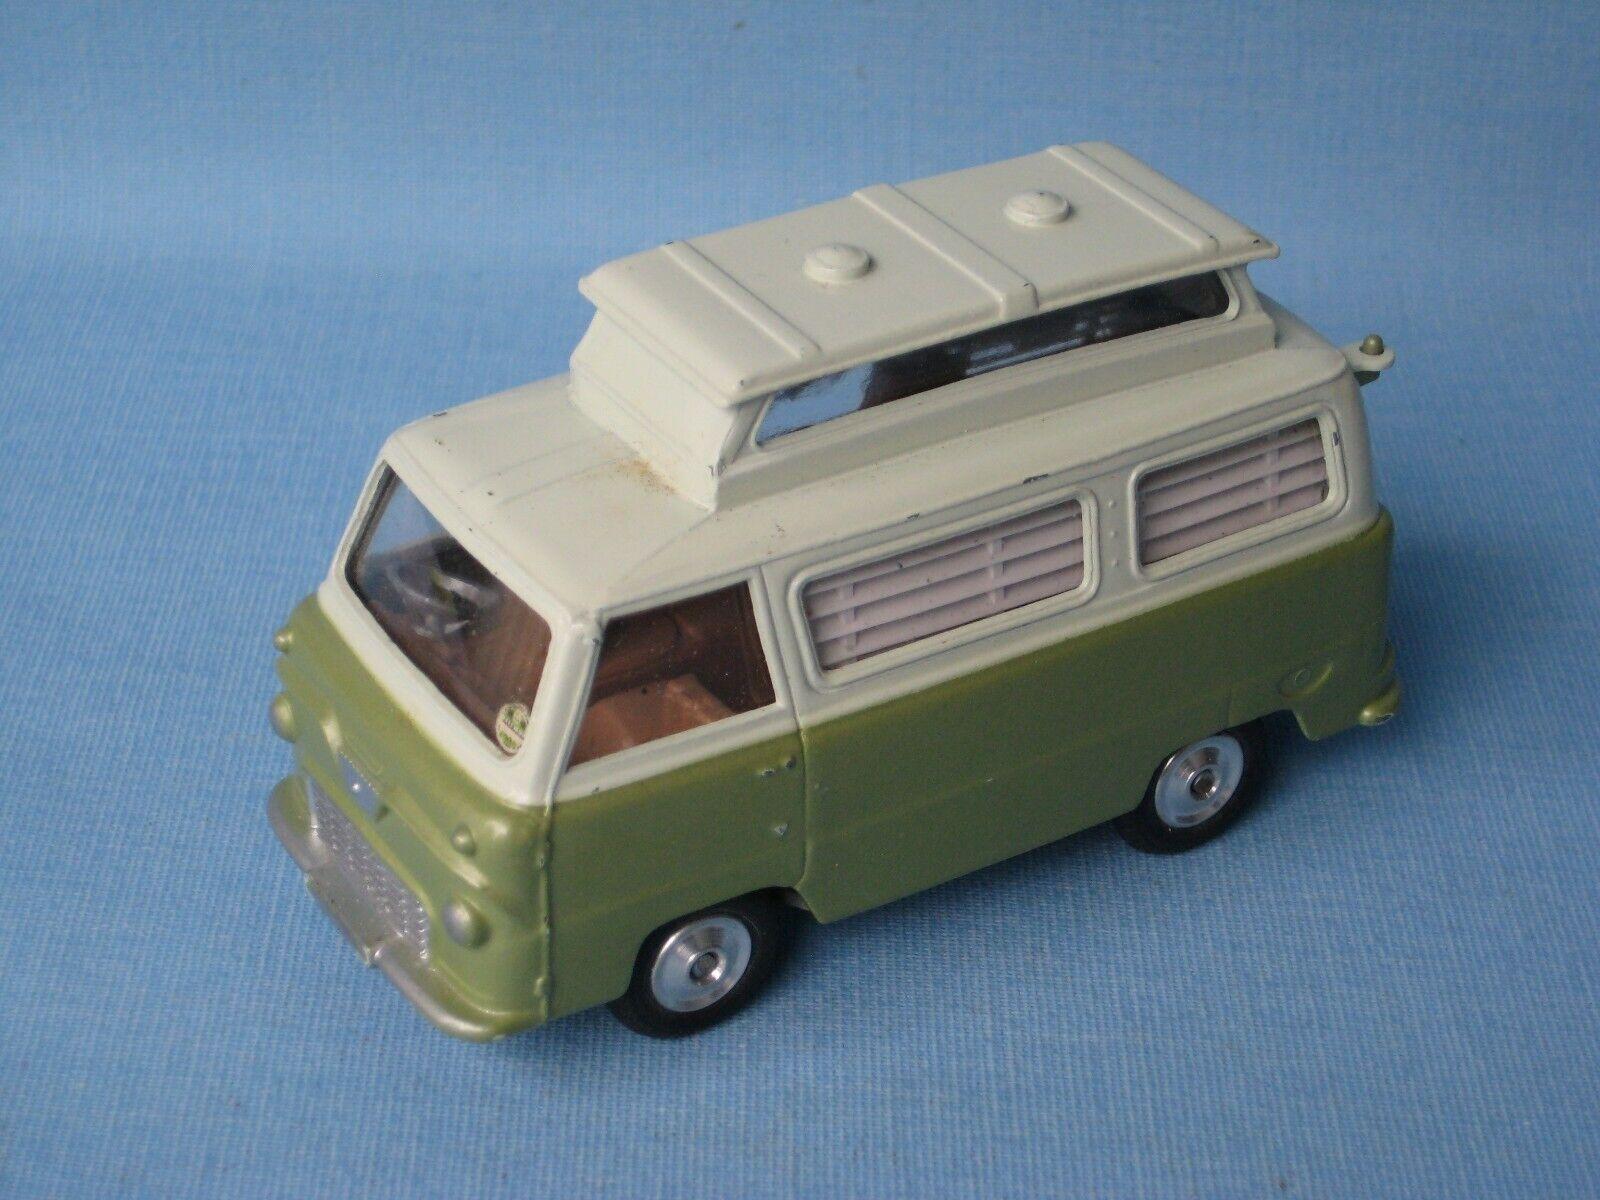 Corgi Toys 420 Ford Thames Airborne bilavan Boxed Toy Model Bil 95mm